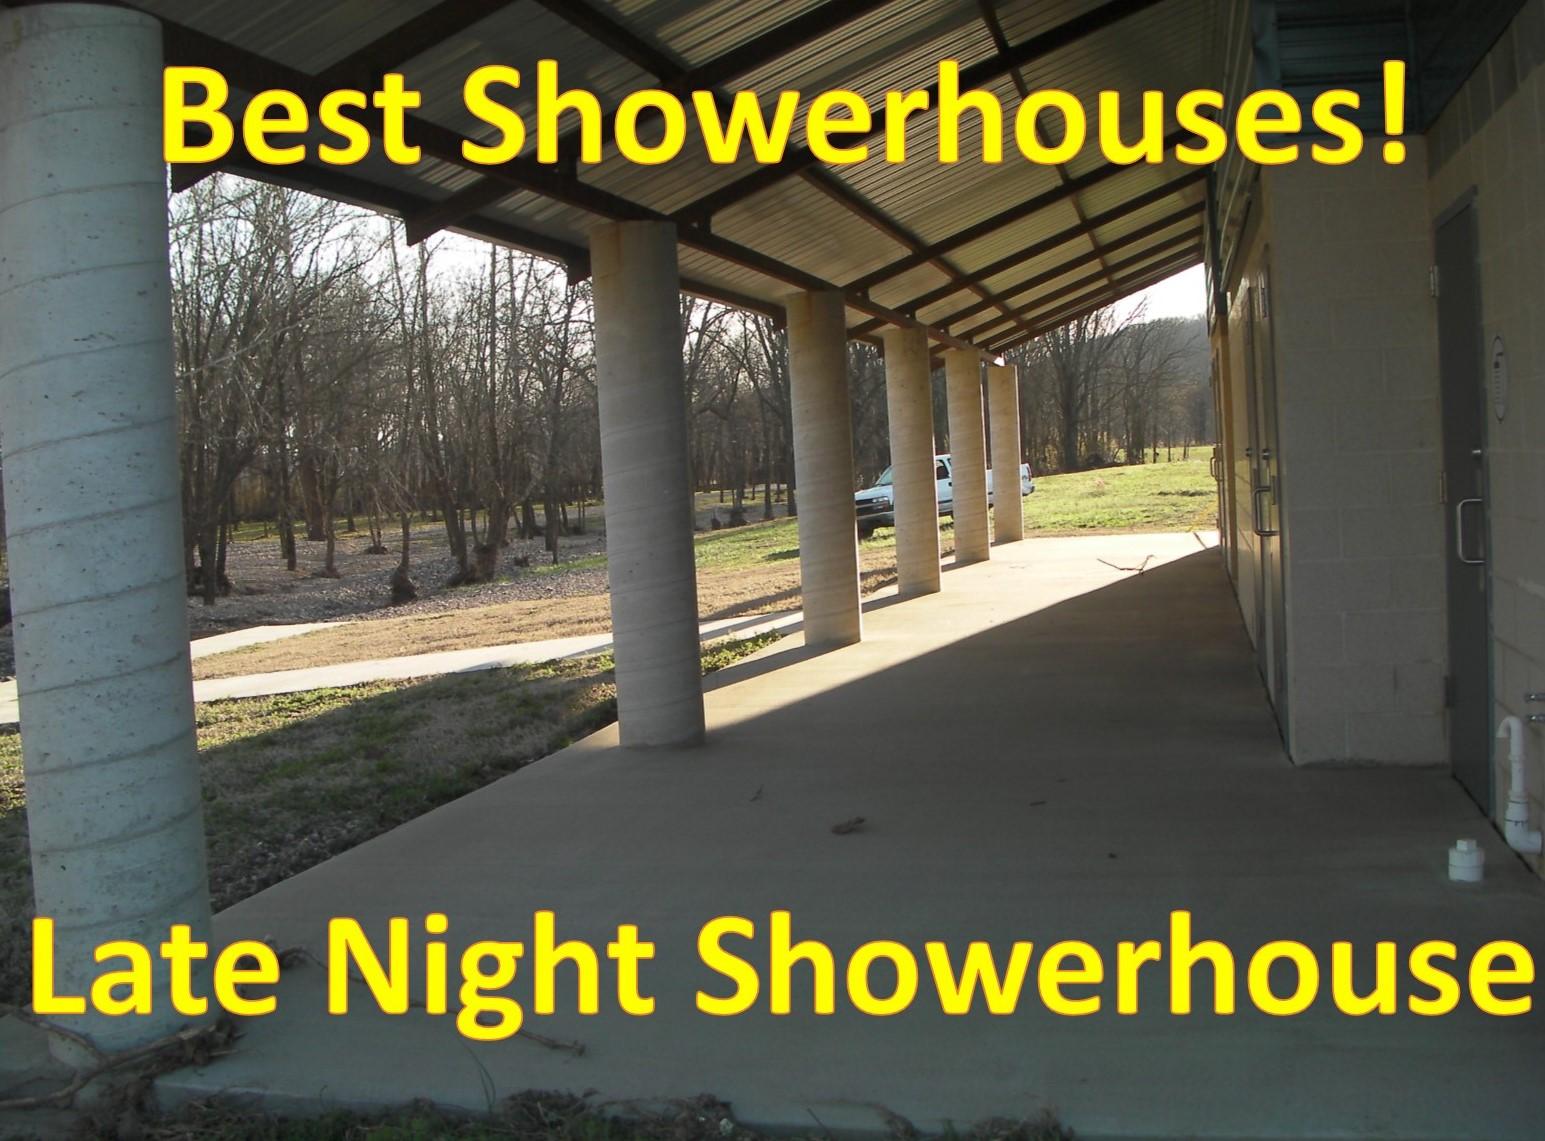 Late Night Showerhouse (2).jpg